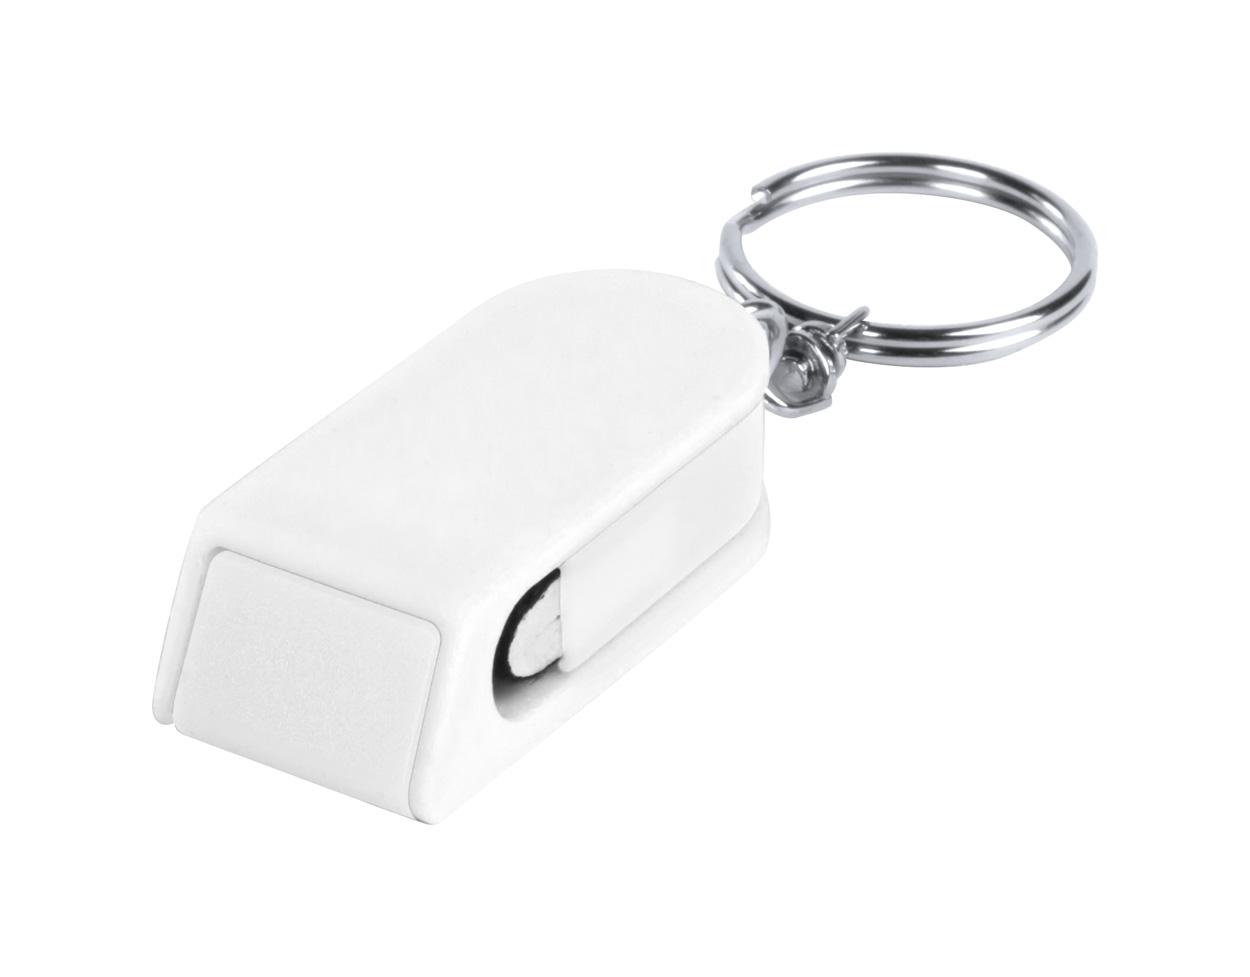 Satari mobile holder keyring